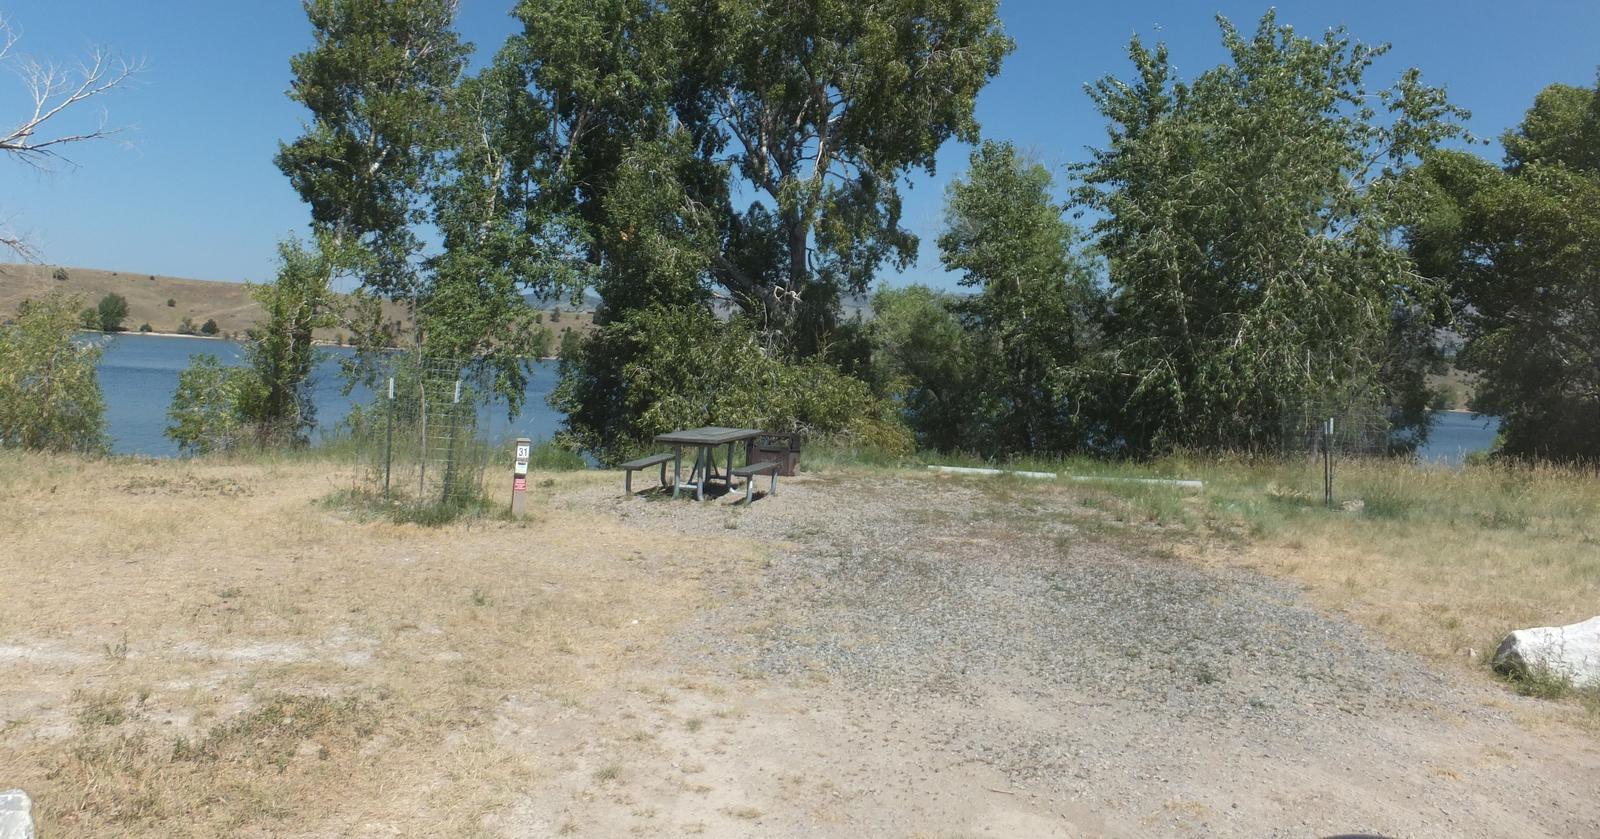 Hellgate Campground - Campsite 31